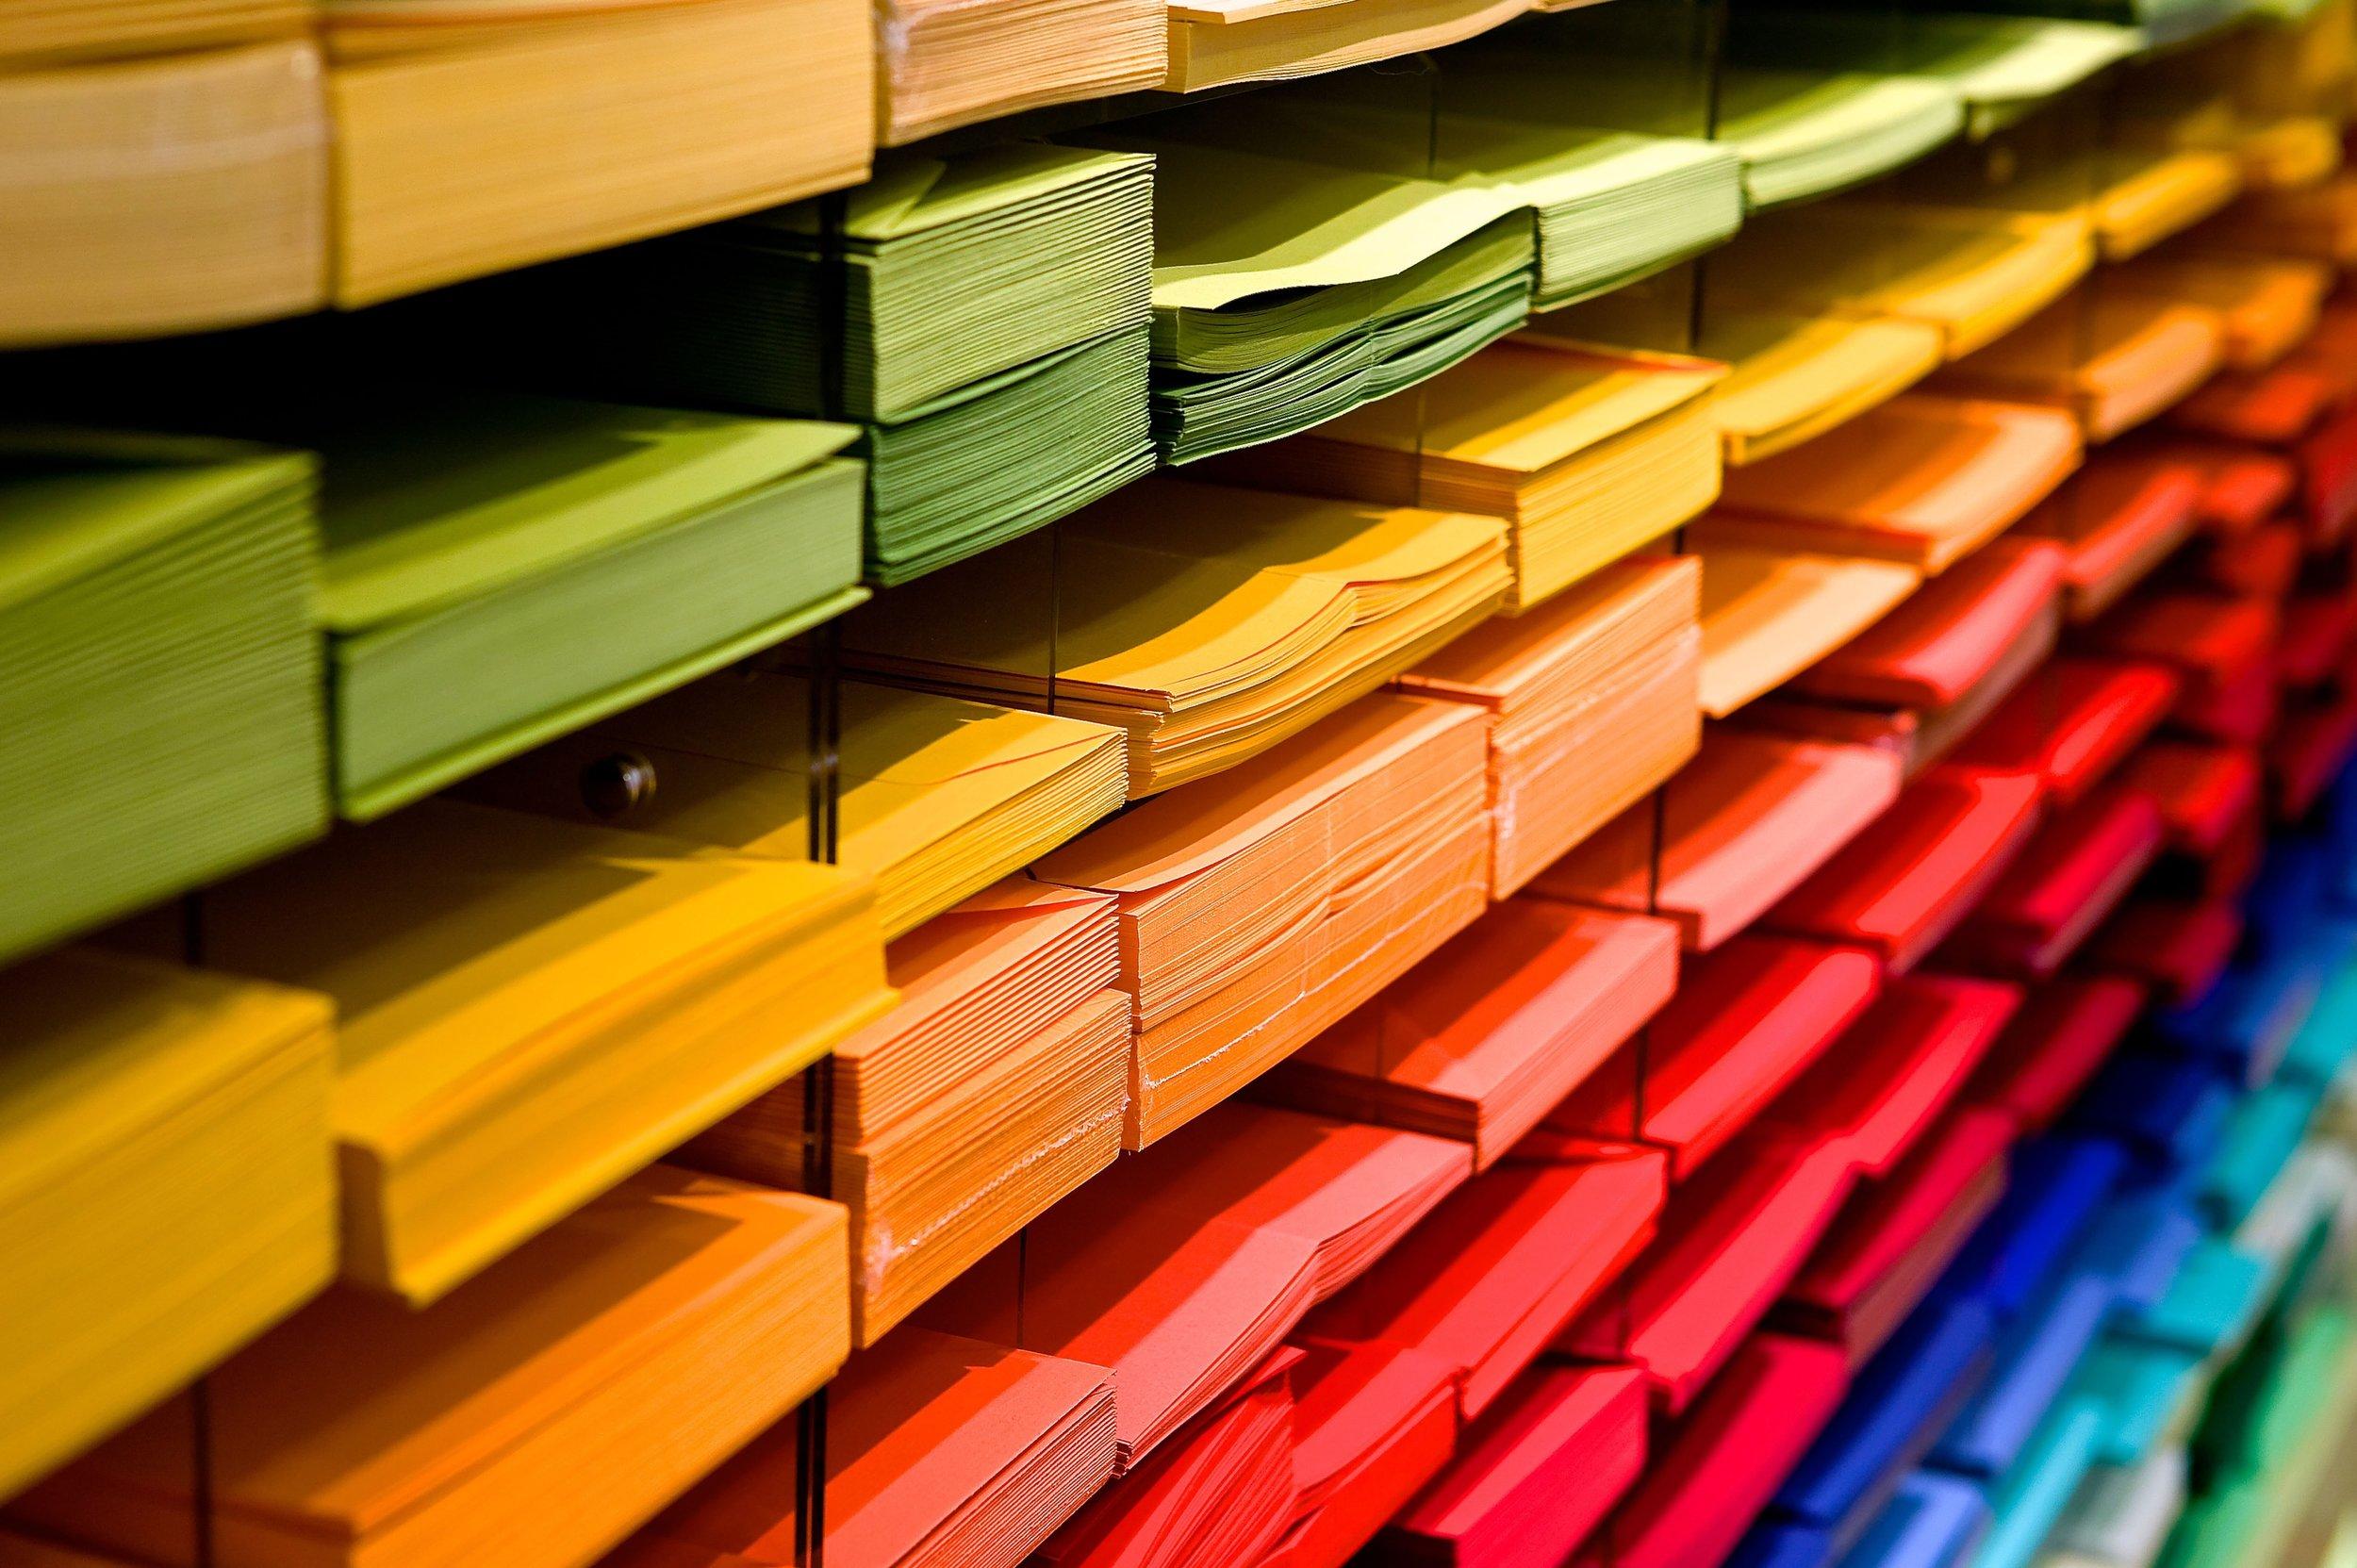 bookstore-color-colorful-159519.jpg